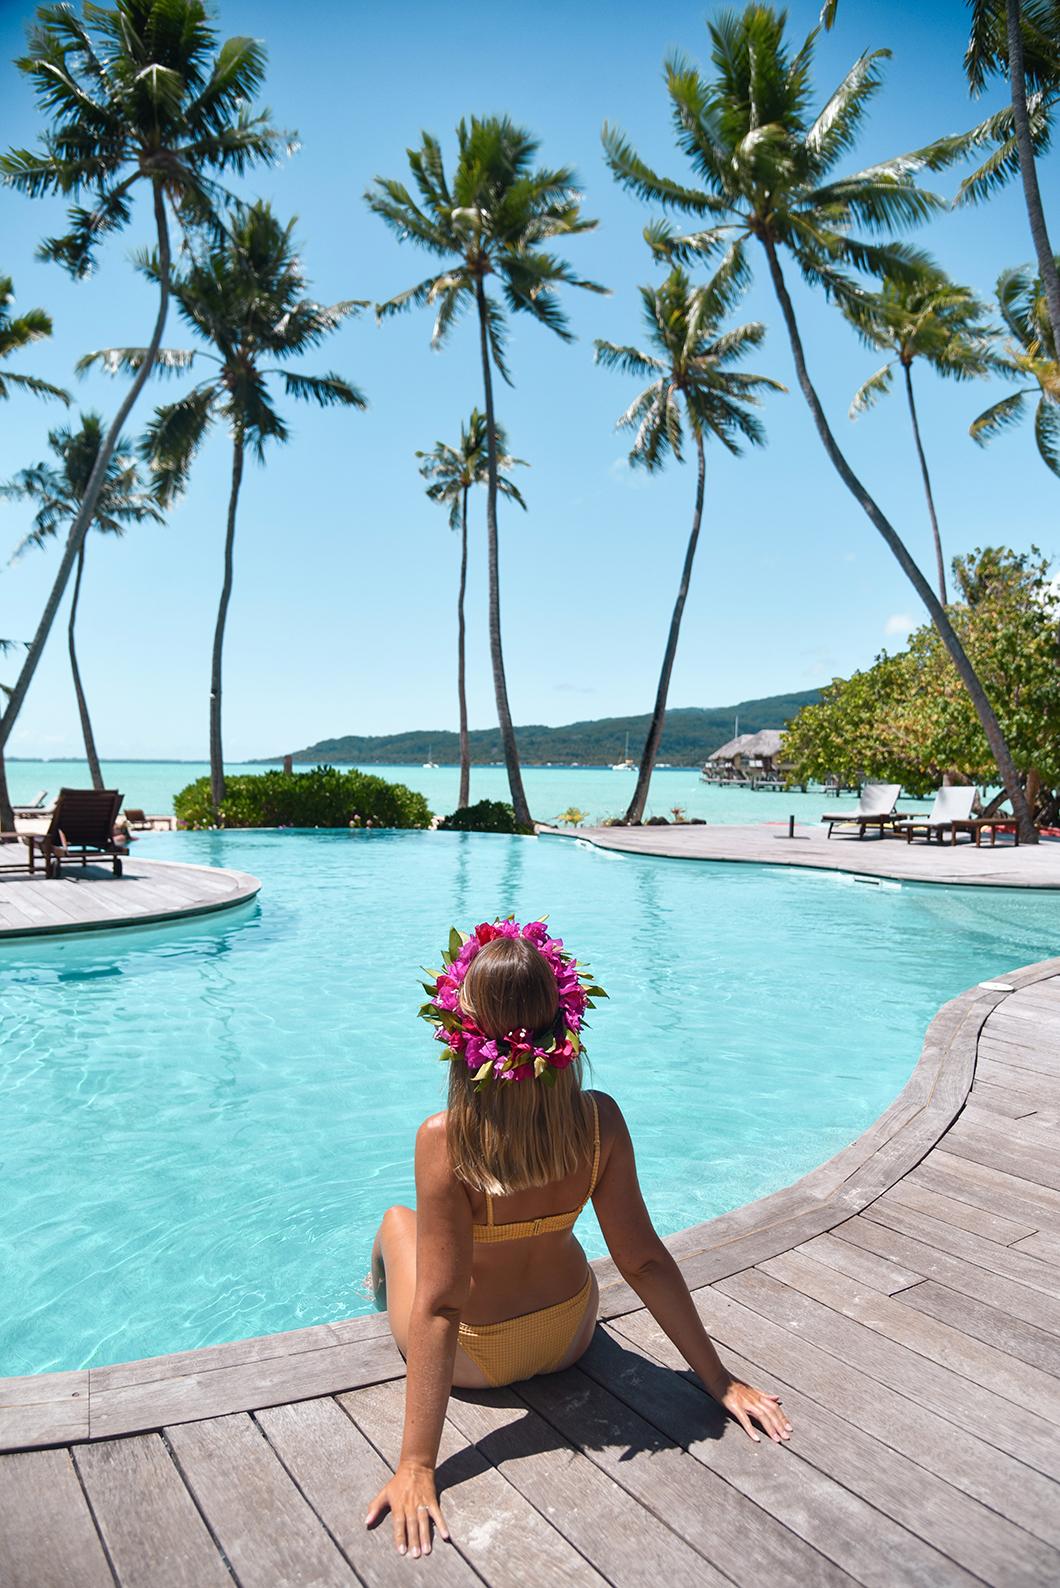 La piscine du Taha'a Island Resort and Spa